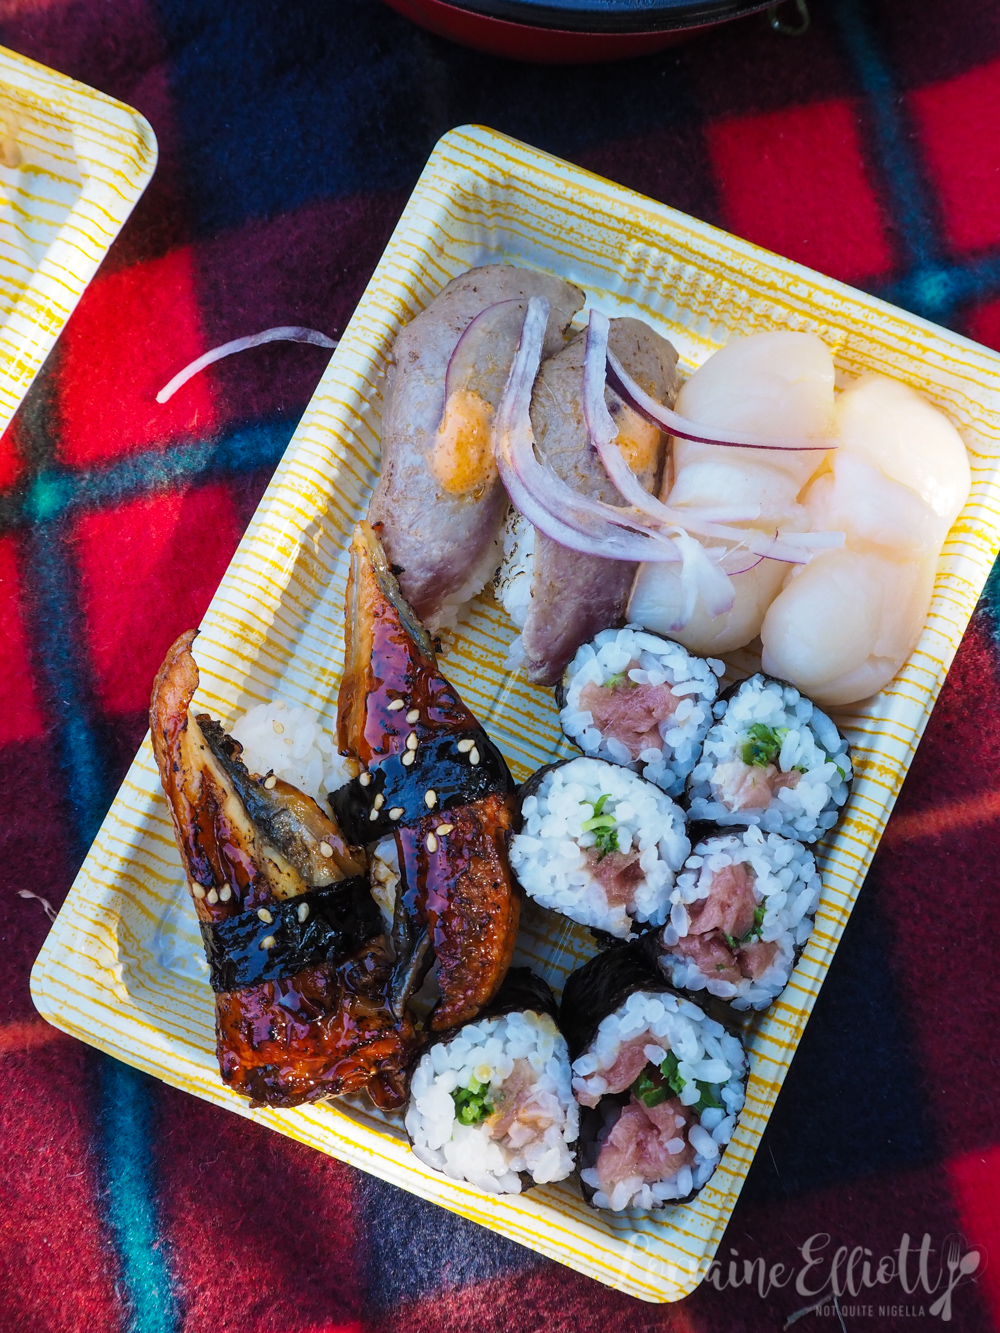 Edomae Sushi Yokocho, Sydney CBD